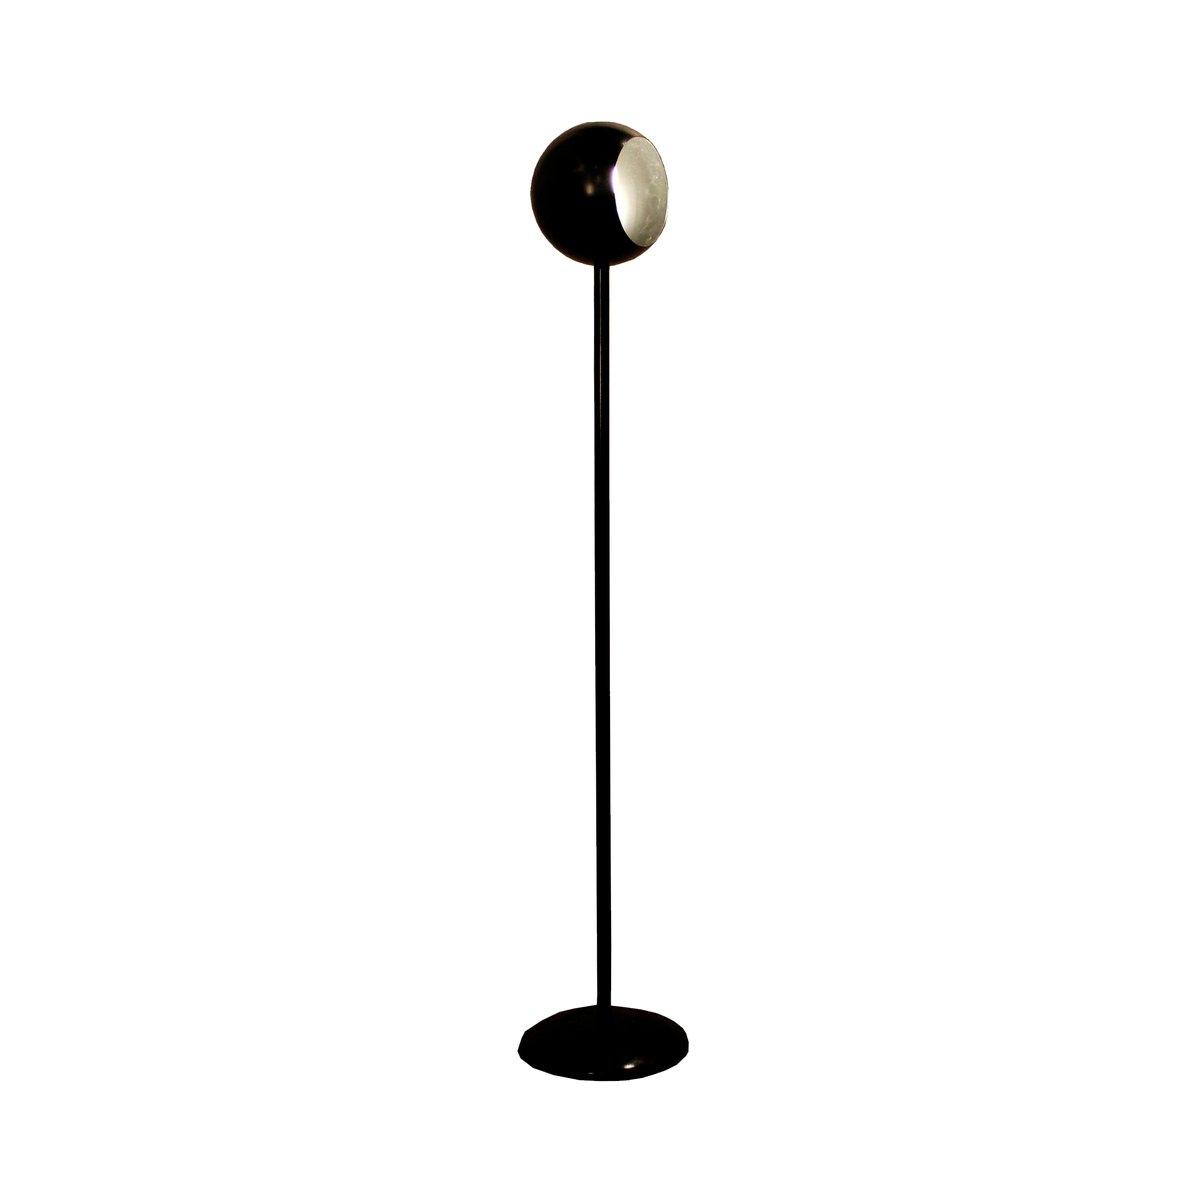 Modell UFO Lampe von Juanma Lizana